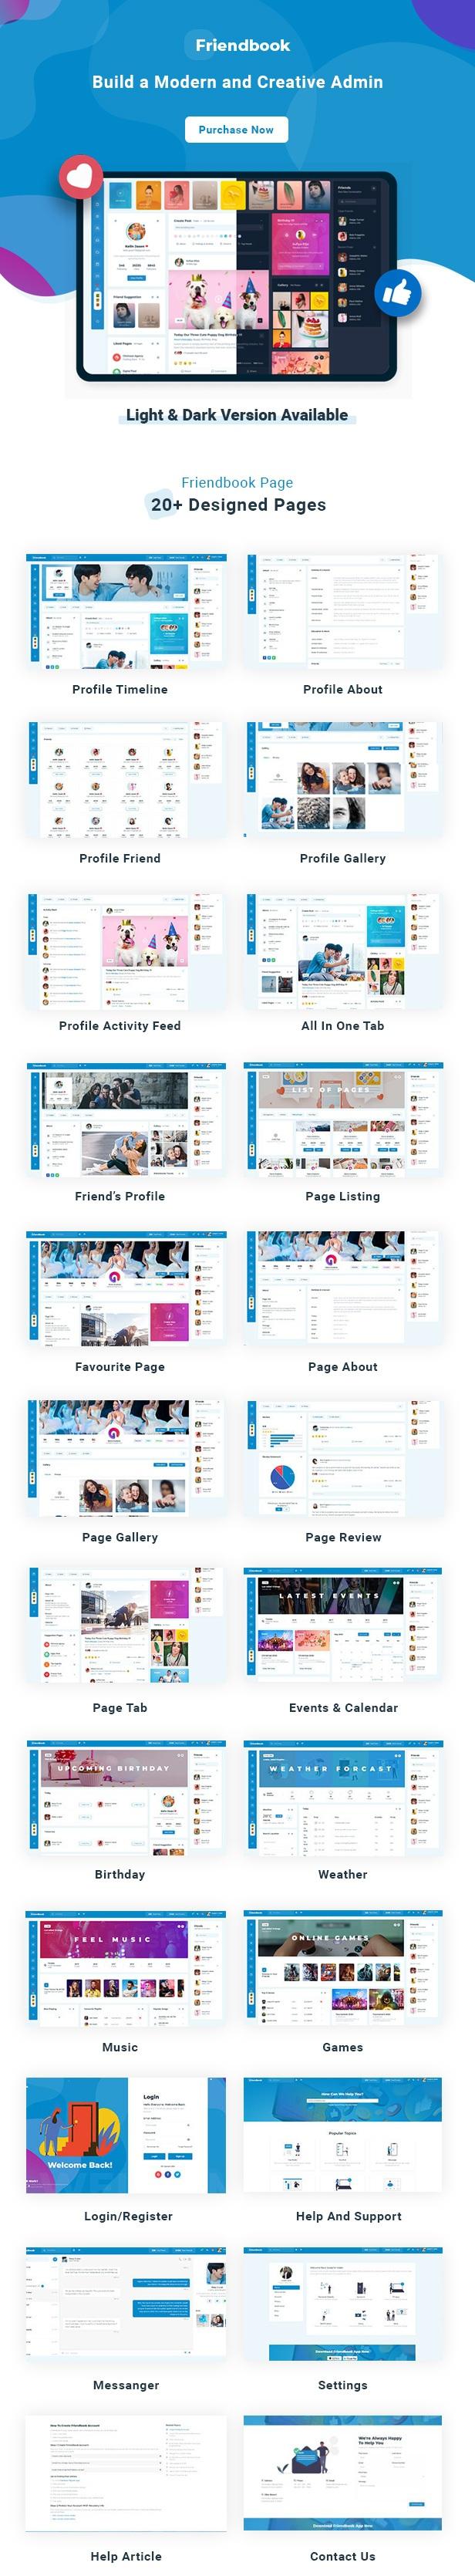 Social Network Social Media Community UI Toolkit Responsive HTML Template